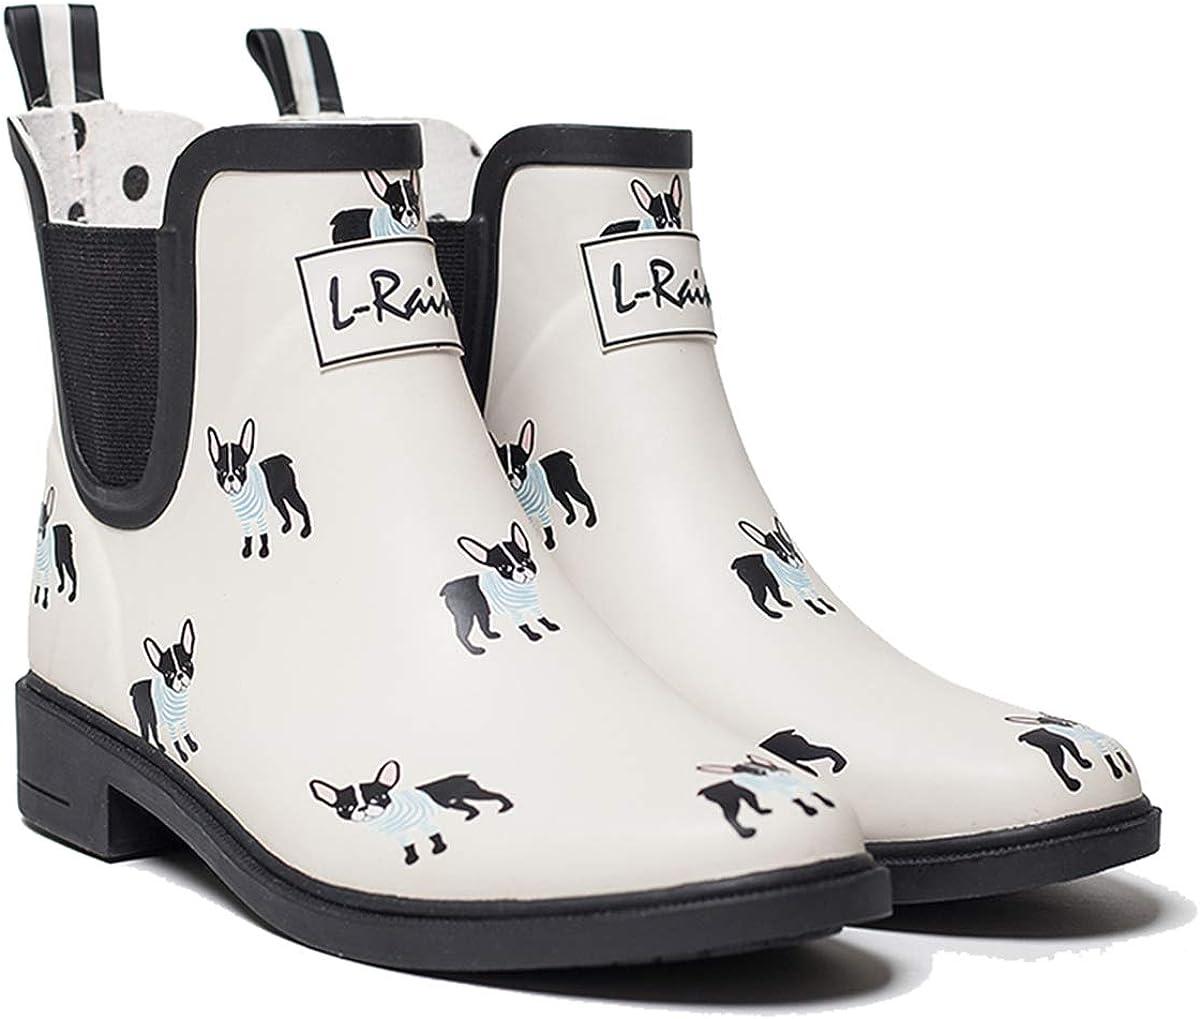 L-Rain LR Women/'s Short Rain Boots Waterproof and Anti-Slipping Rain Shoes Chelsea Booties